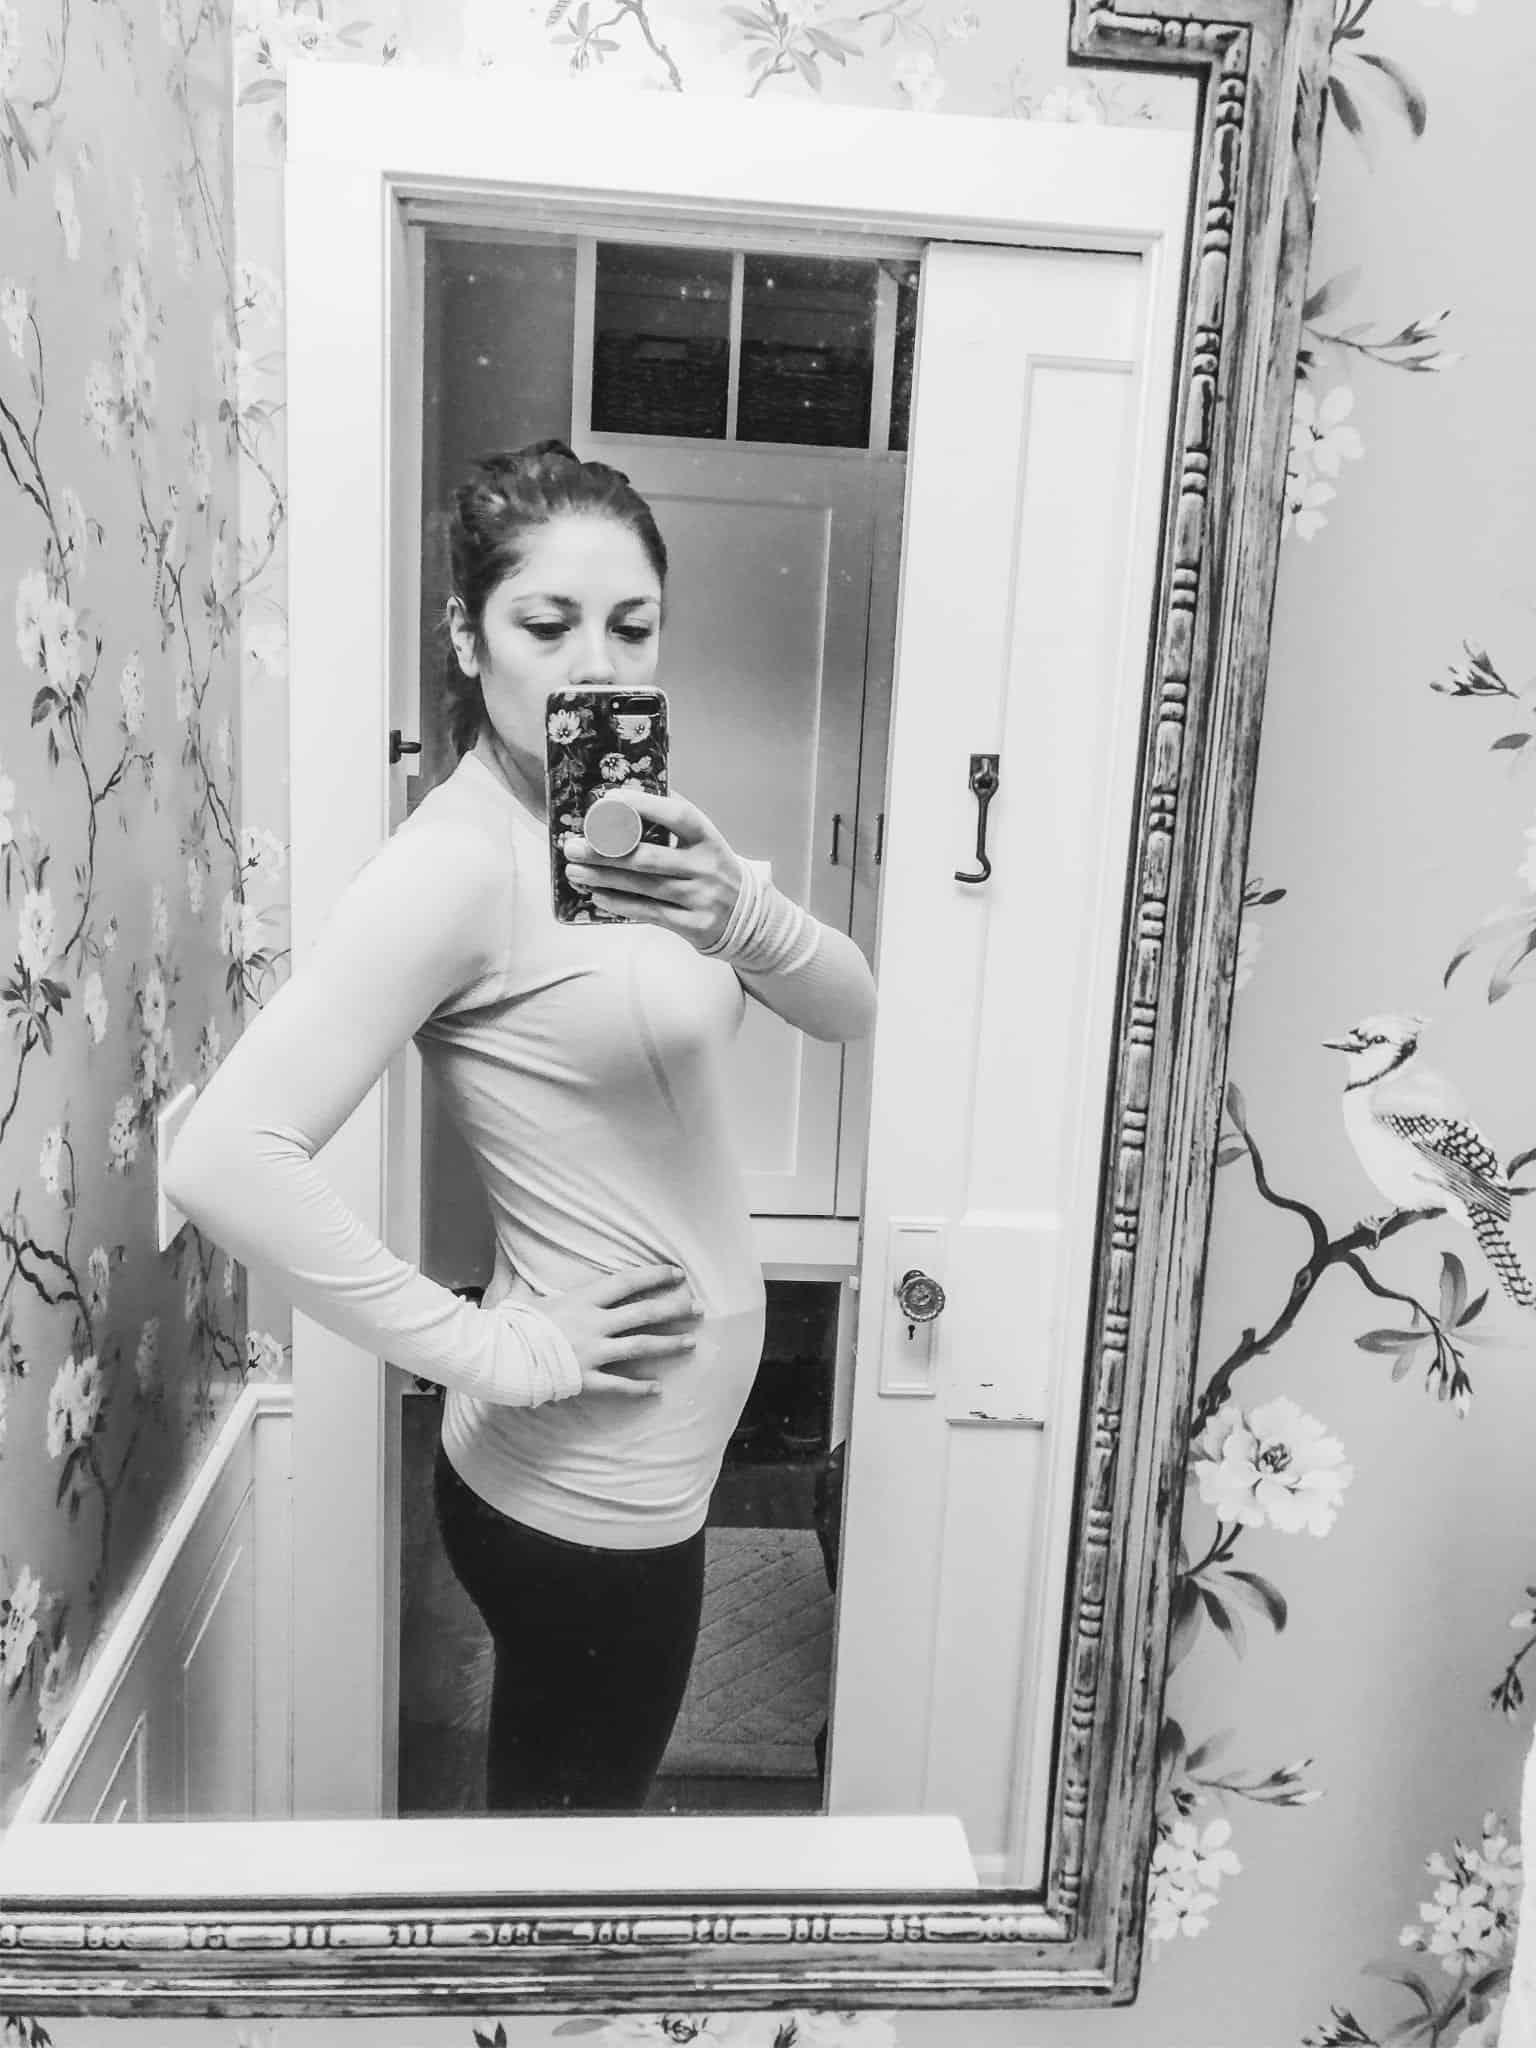 First Trimester - #firsttrimester #pregnancy #tararochfordnutrition